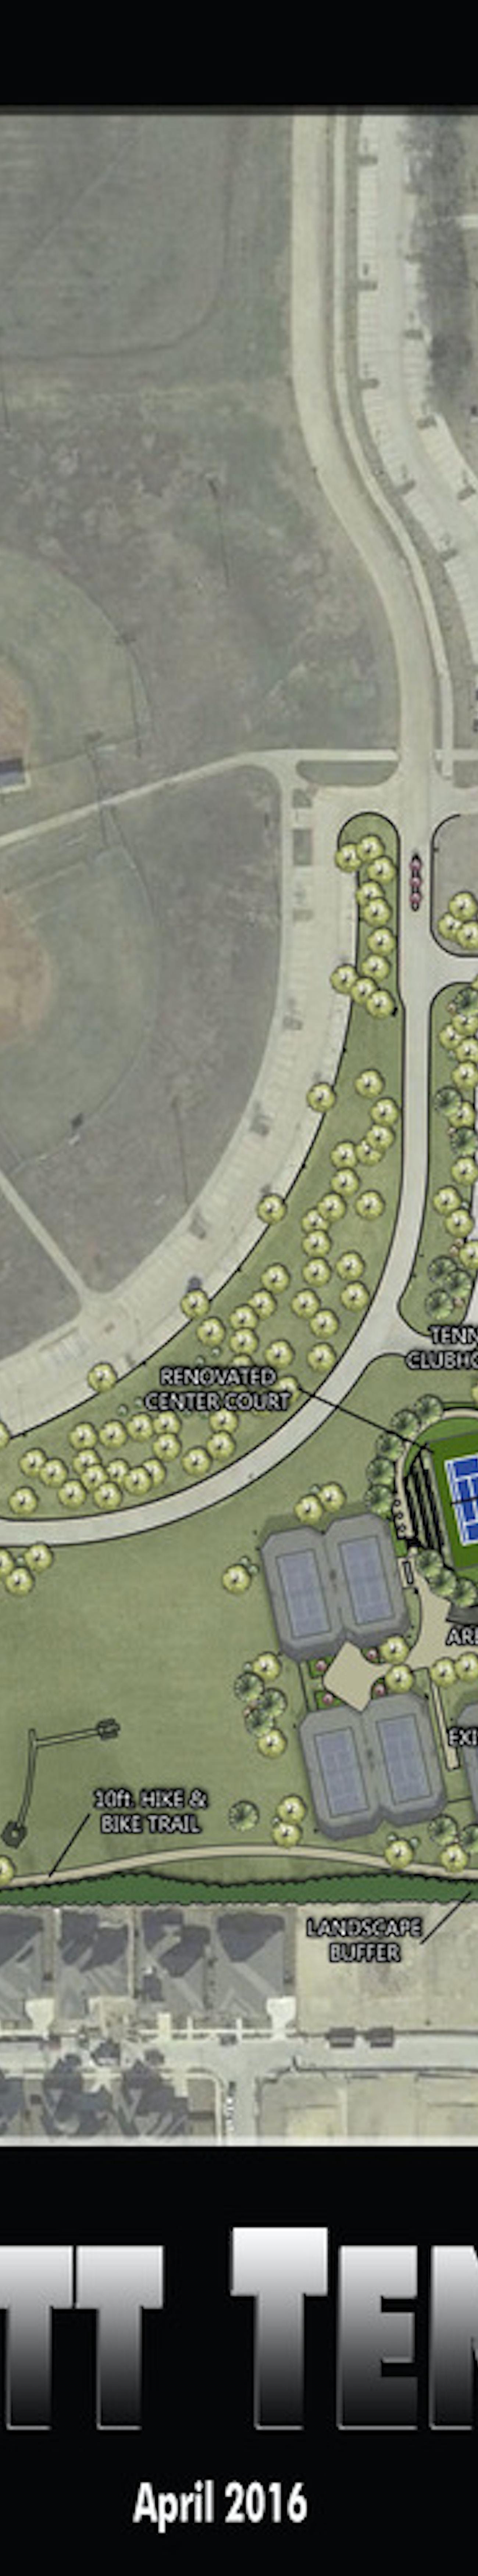 Gabe Nesbitt Tennis Center Expansion Master Plan